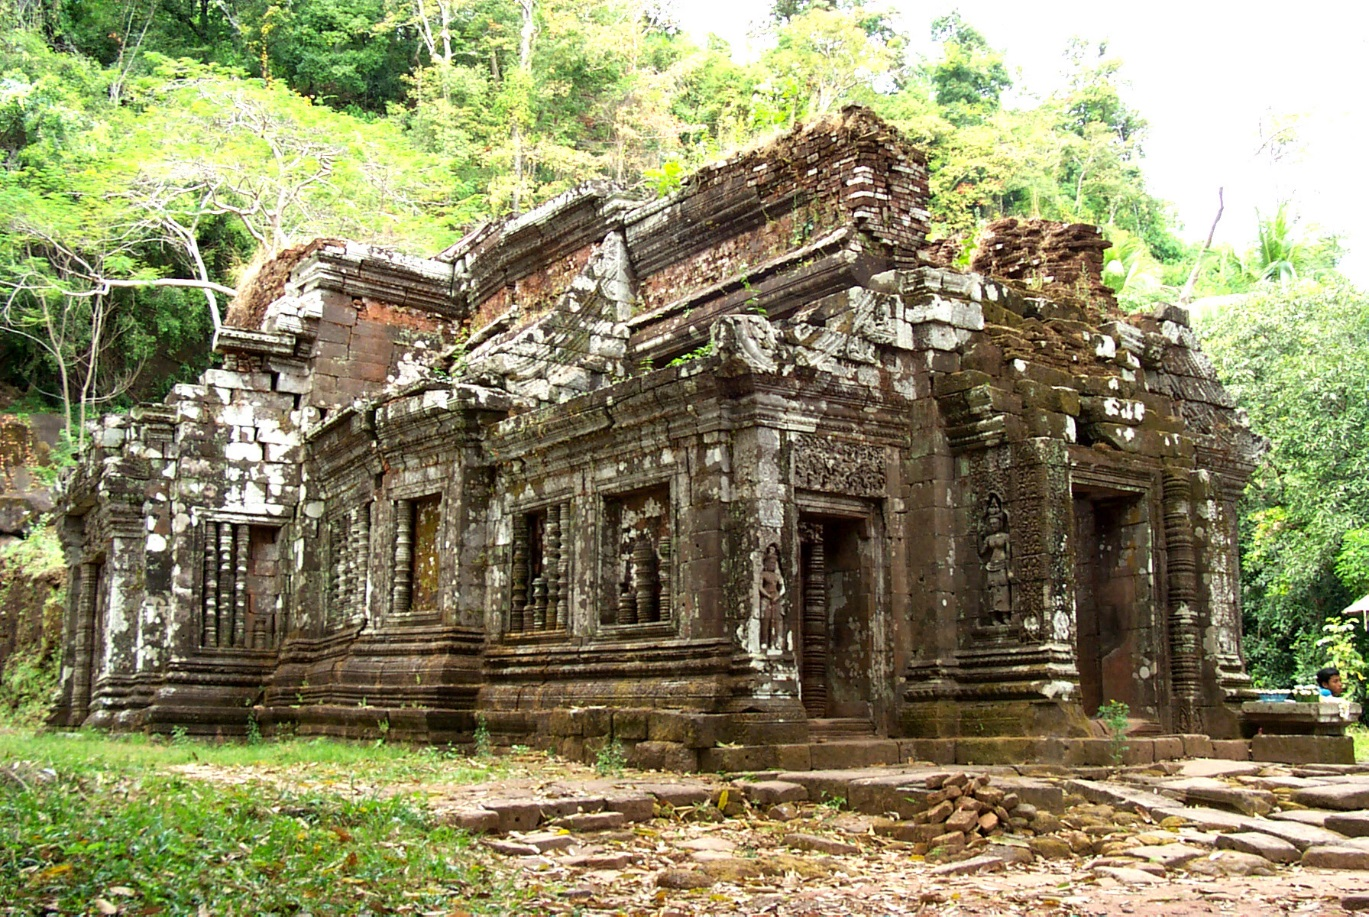 Wat Phou – a Khmer temple